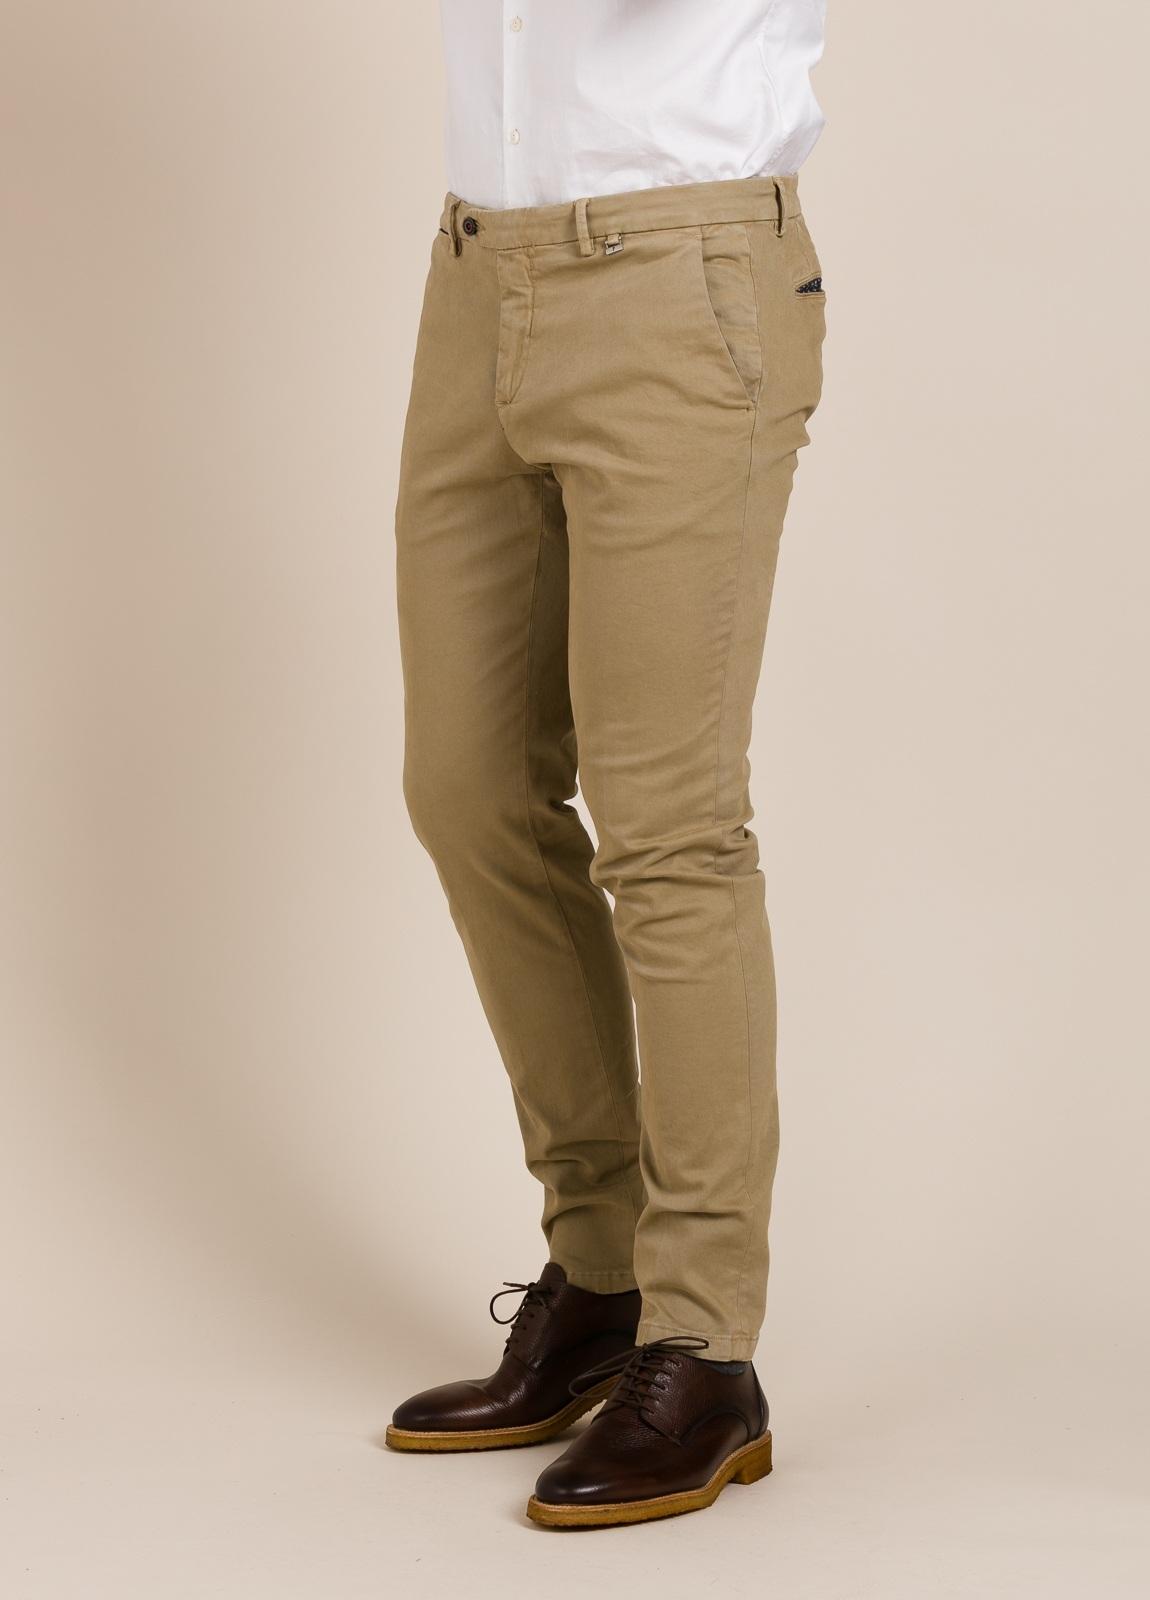 Pantalón chino PAOLONI beige.